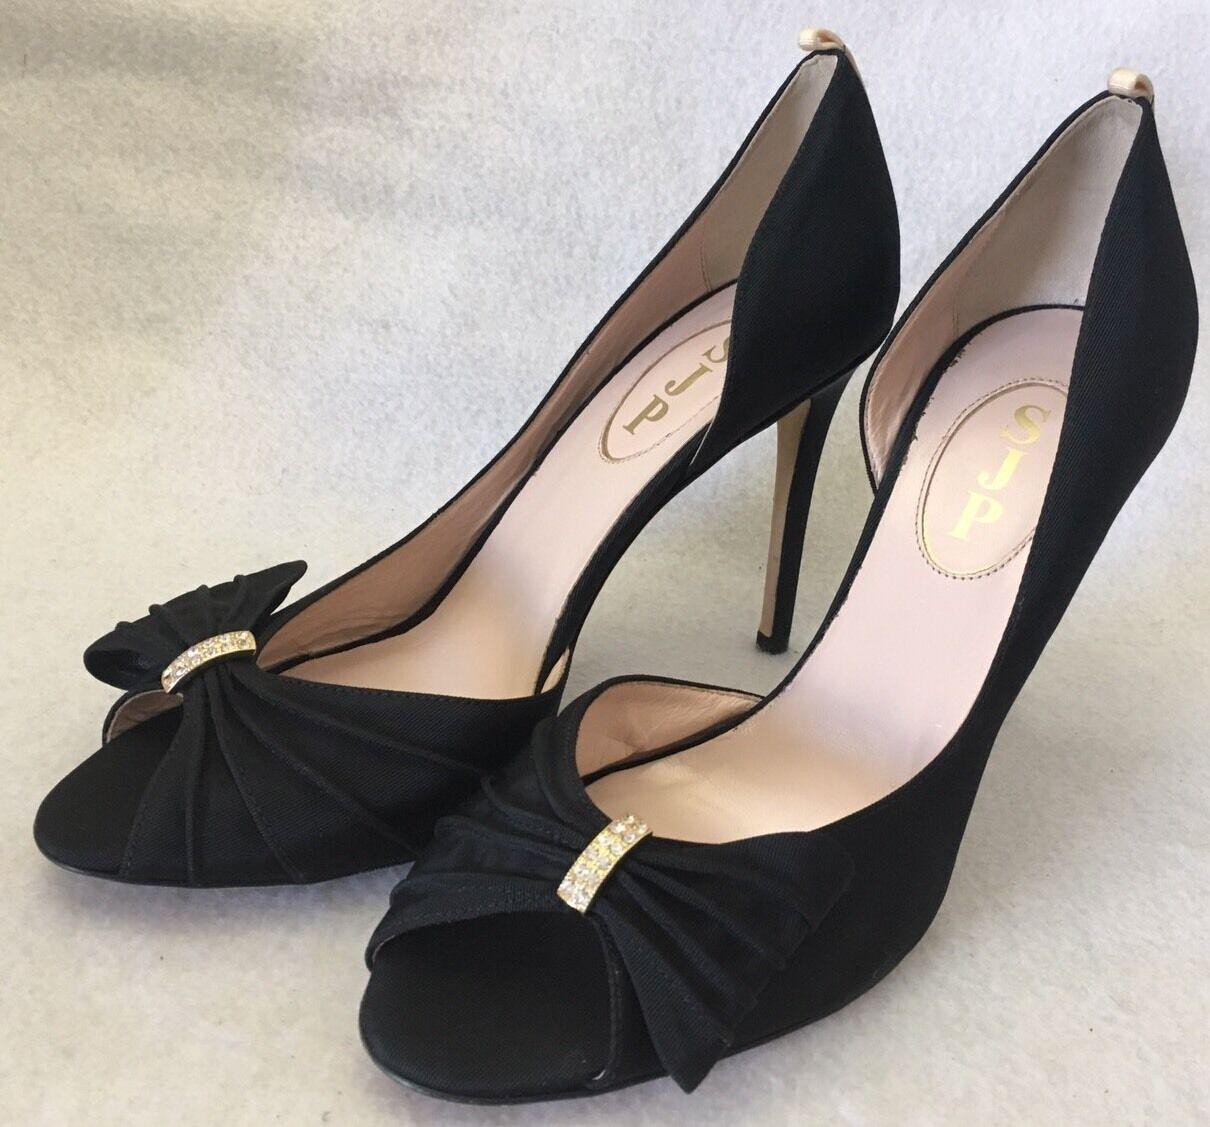 SJP Sarah Jessica Parker Doris D 'Orsay pump pump pump arco raso zapatos talla 38.5  385 029377